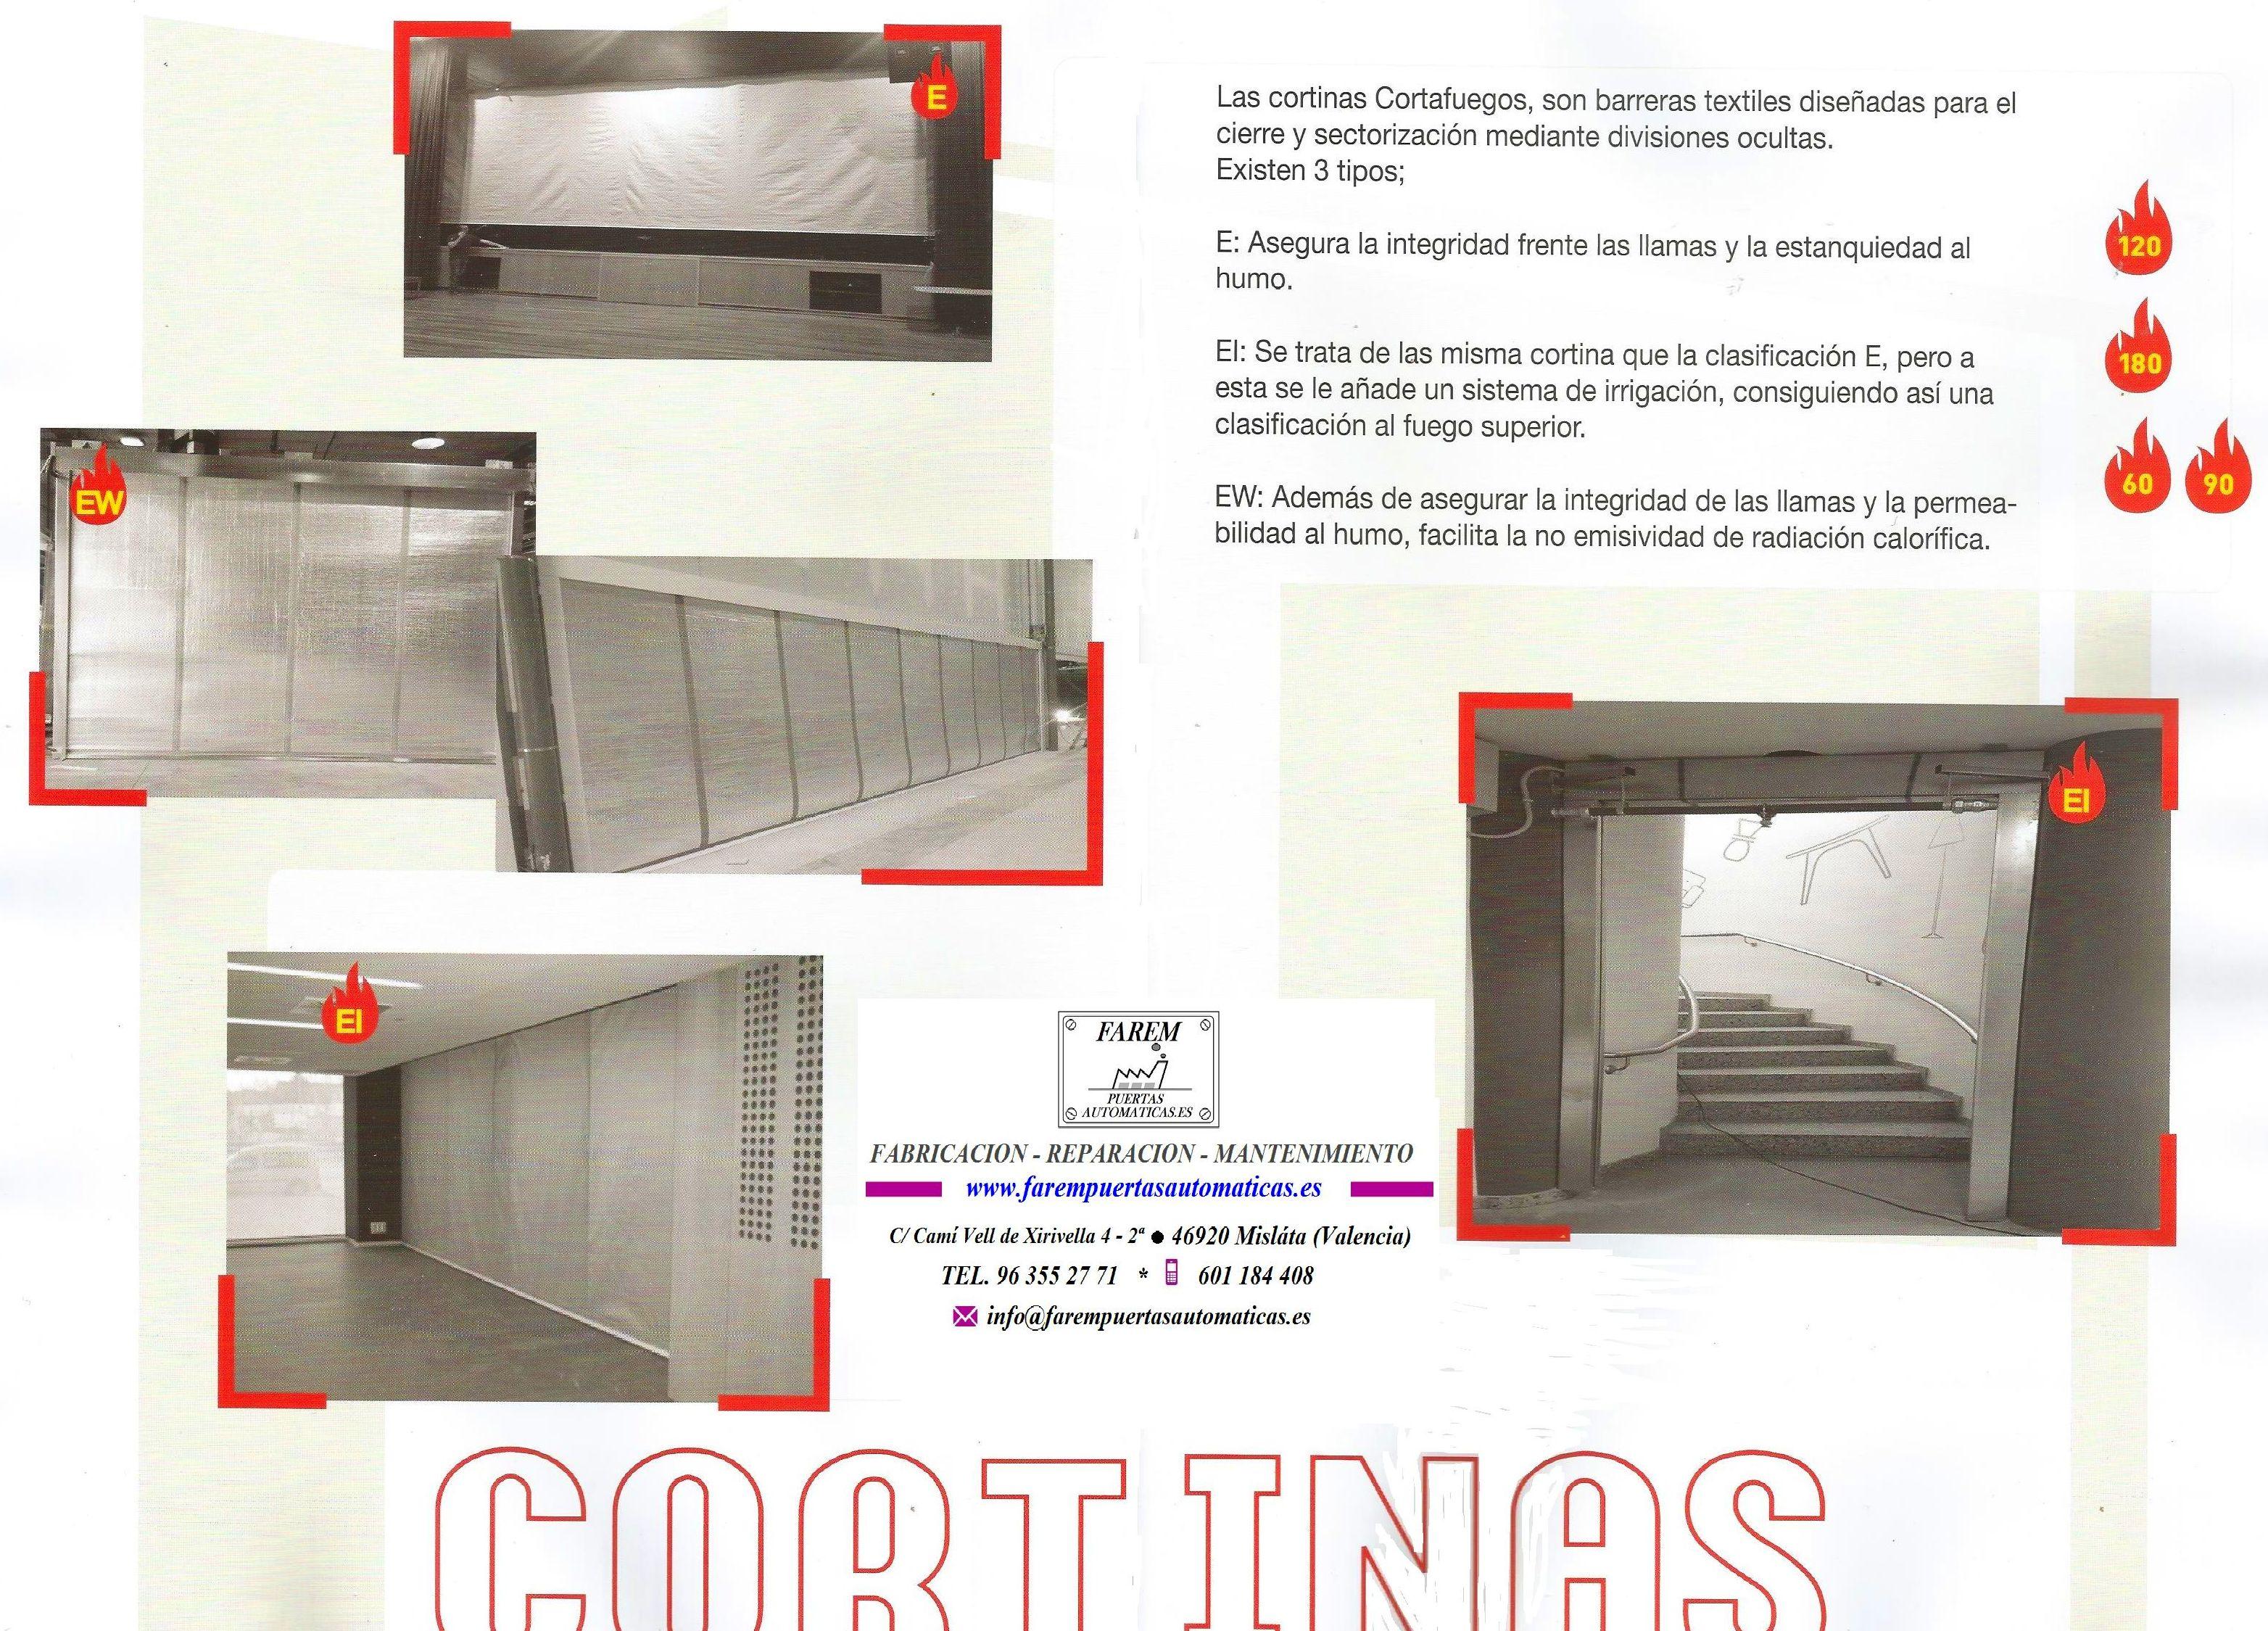 Sistemas de Cortinas textiles cortafuegos certificadas